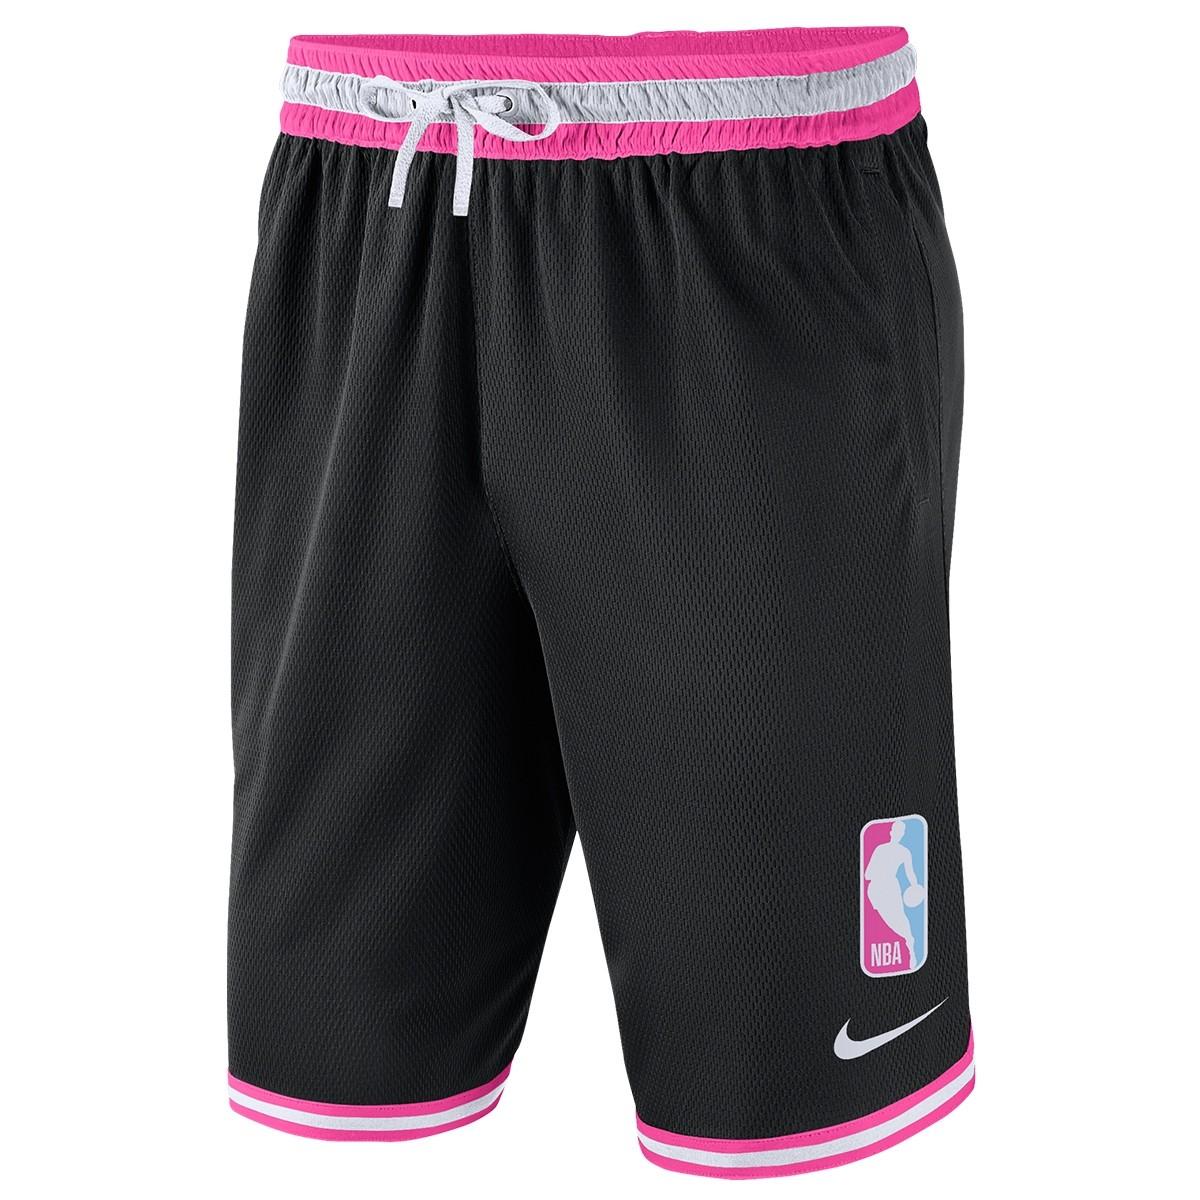 Nike Short Team 31 DNA 'Black'